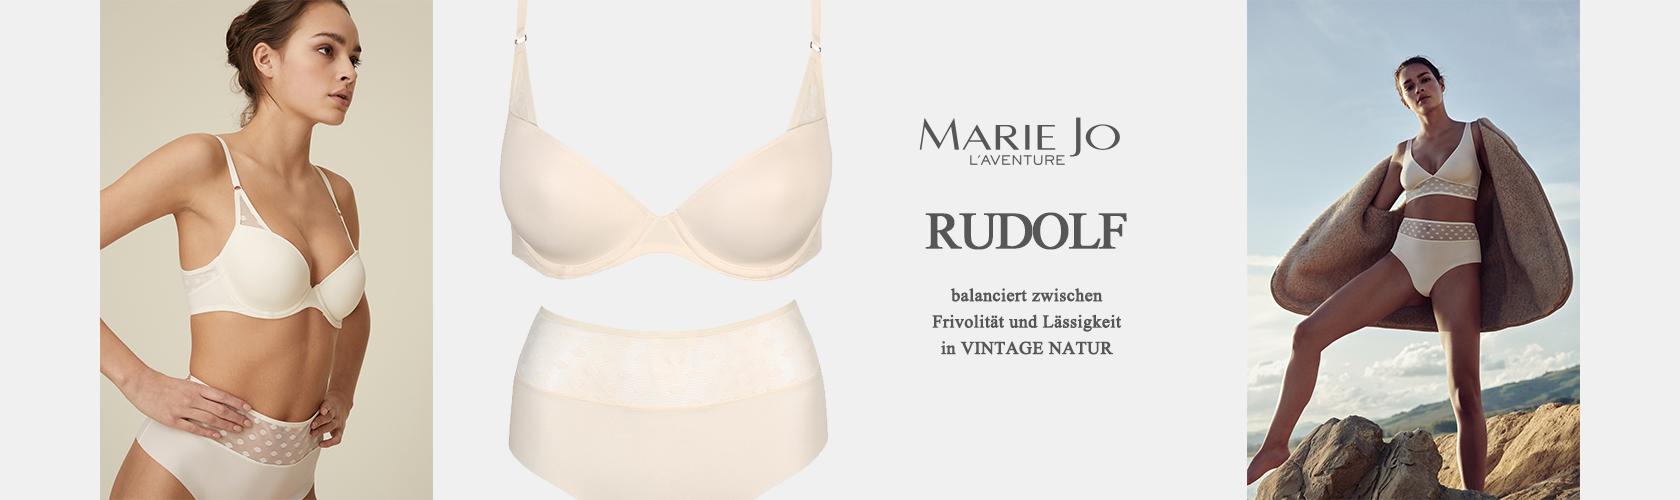 Slideshow RUDOLF VIG 25.09.